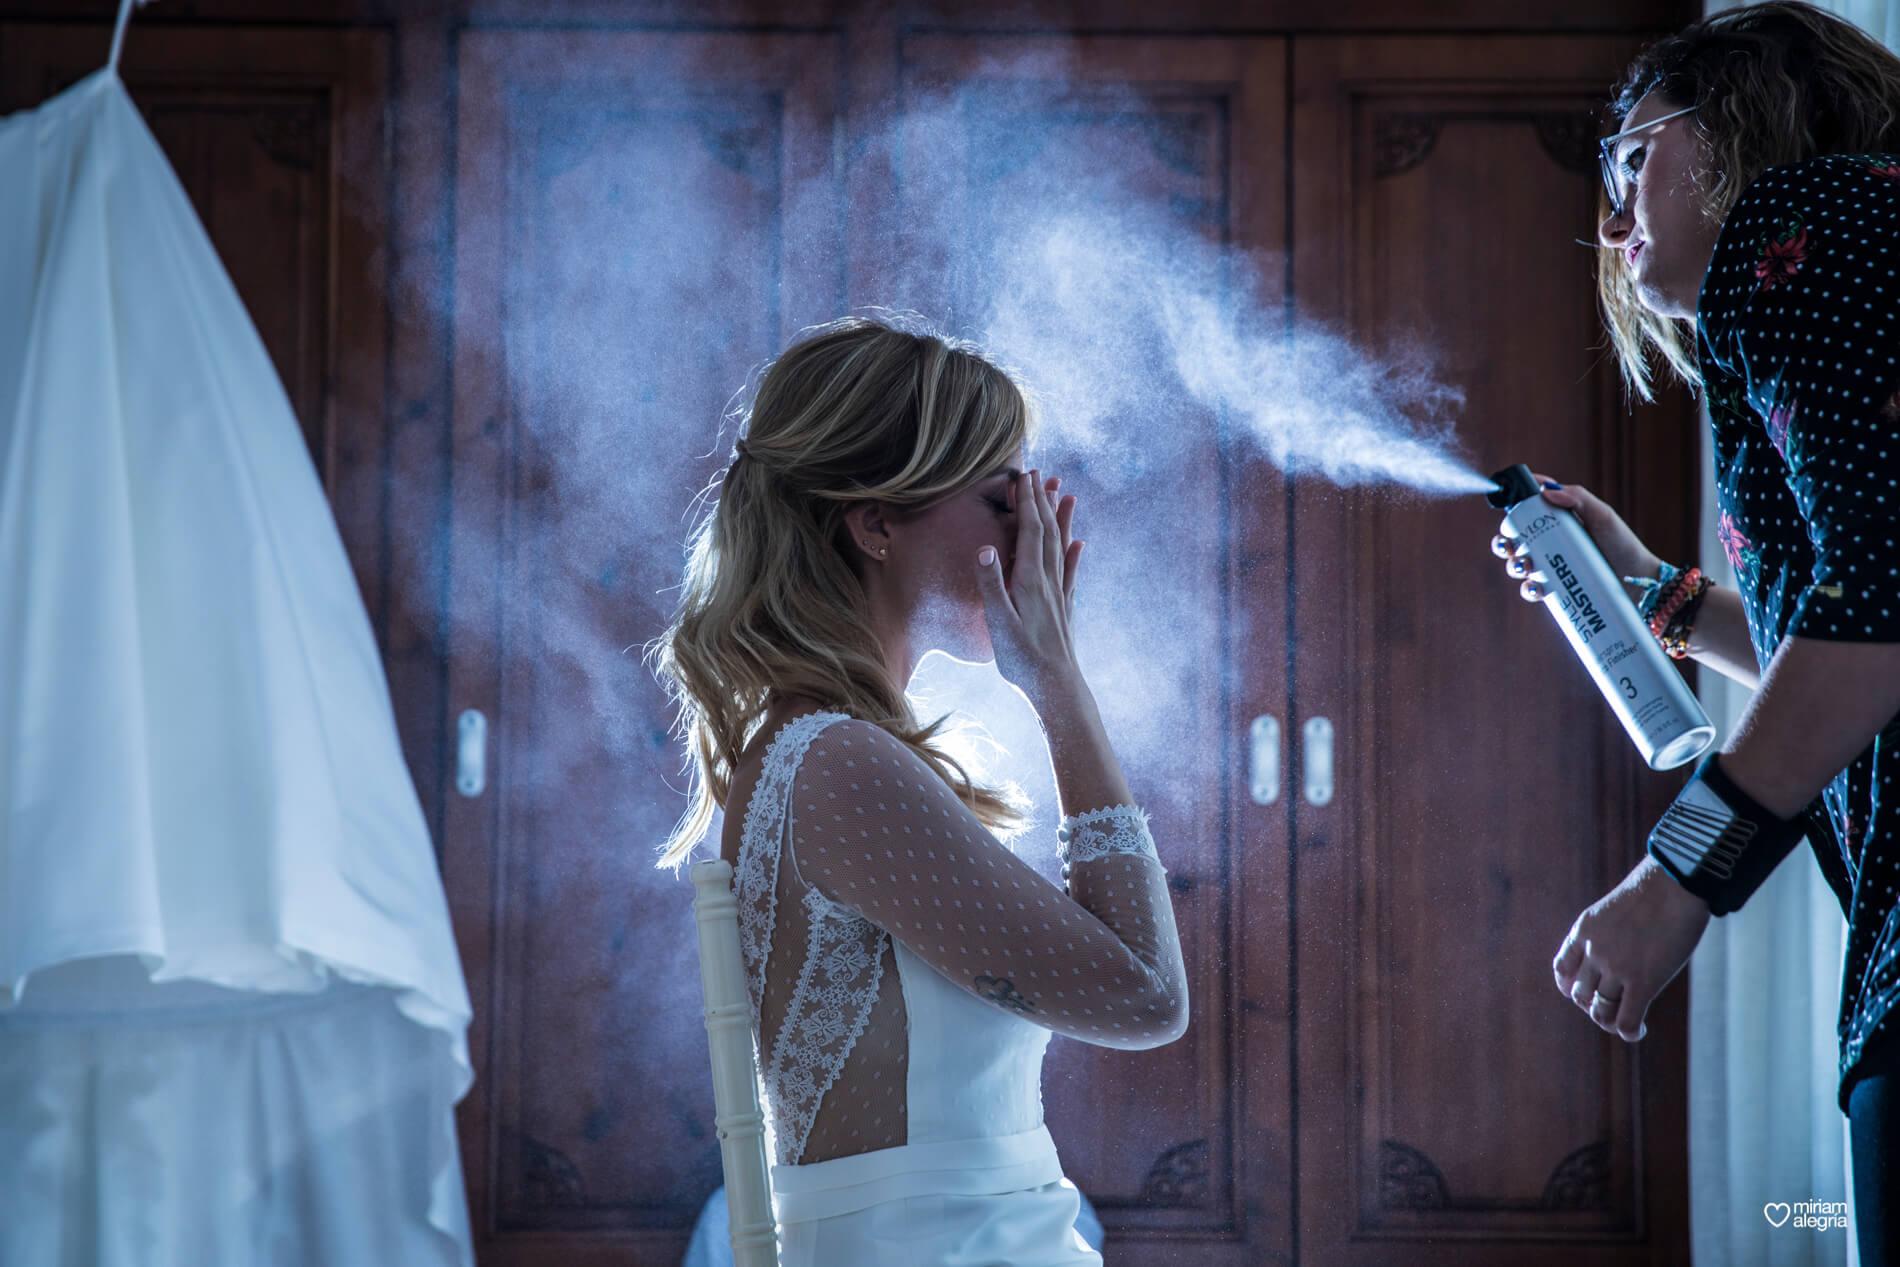 la-boda-de-alemc7-miriam-alegria-fotografos-boda-murcia-23